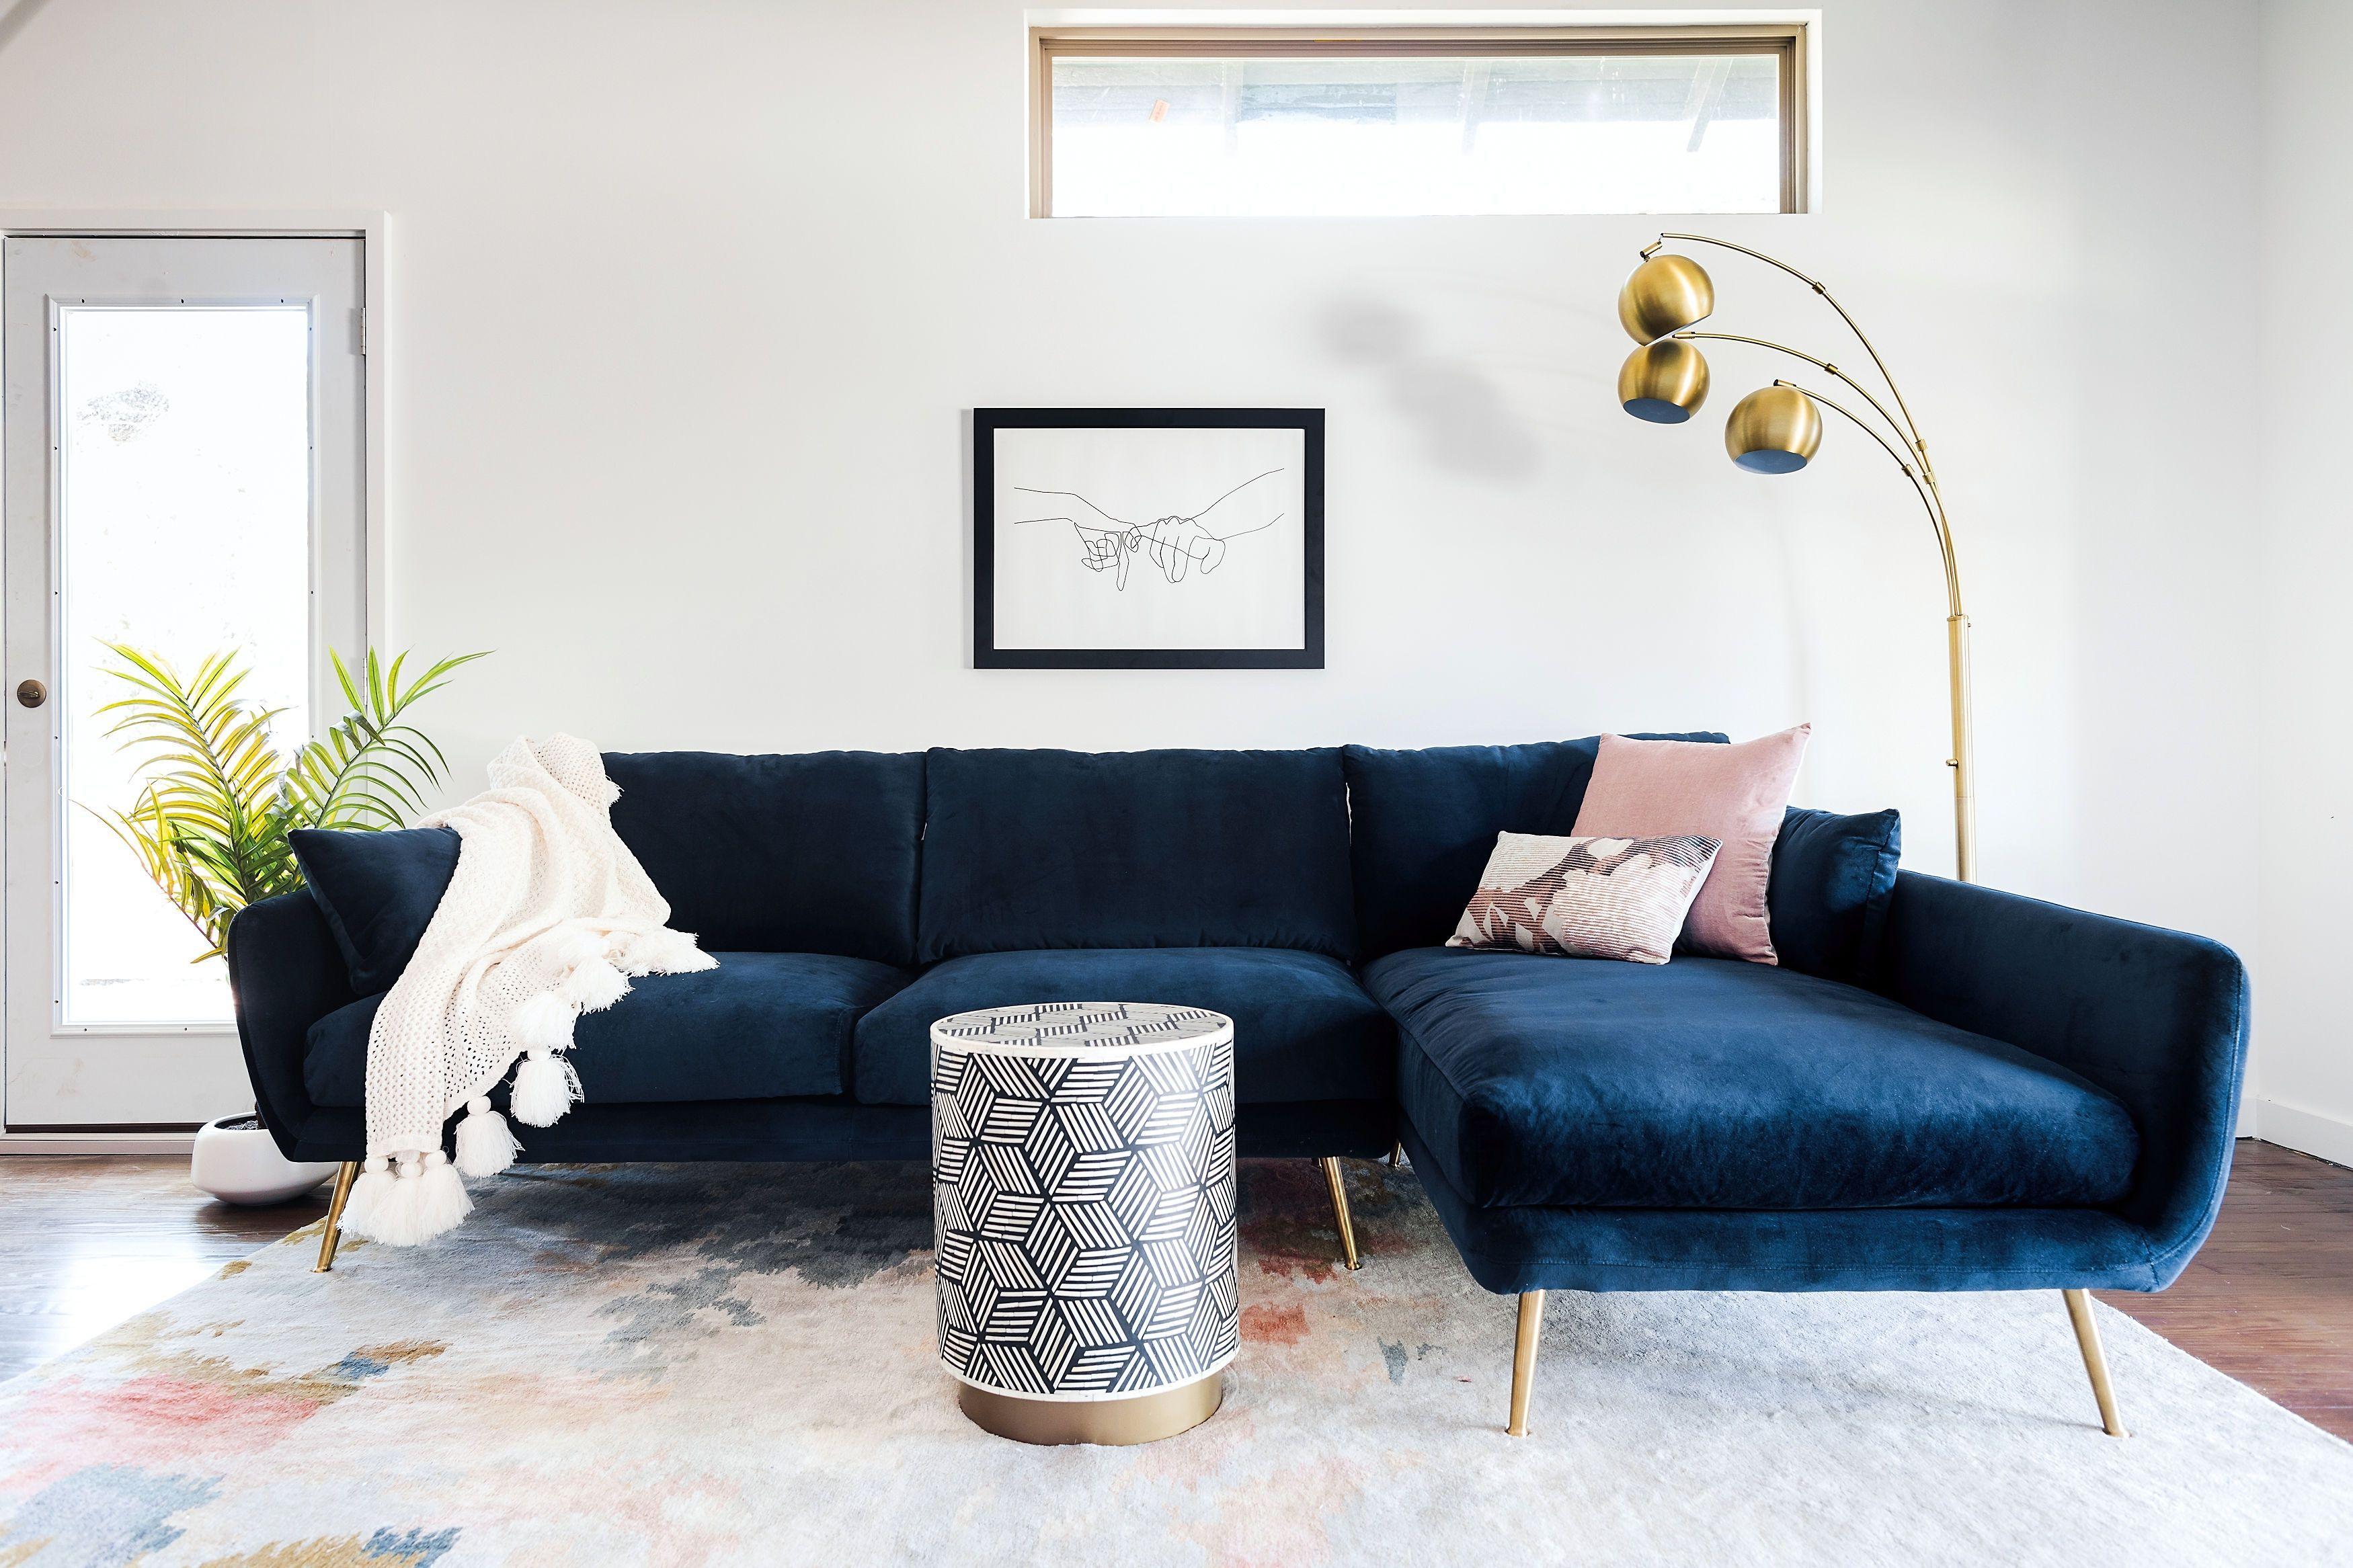 Harlow Sectional Sofa Midnight Blue Velvet Edloe Finch Furniture Co Blue Couch Living Room Blue Sofas Living Room Velvet Couch Living Room